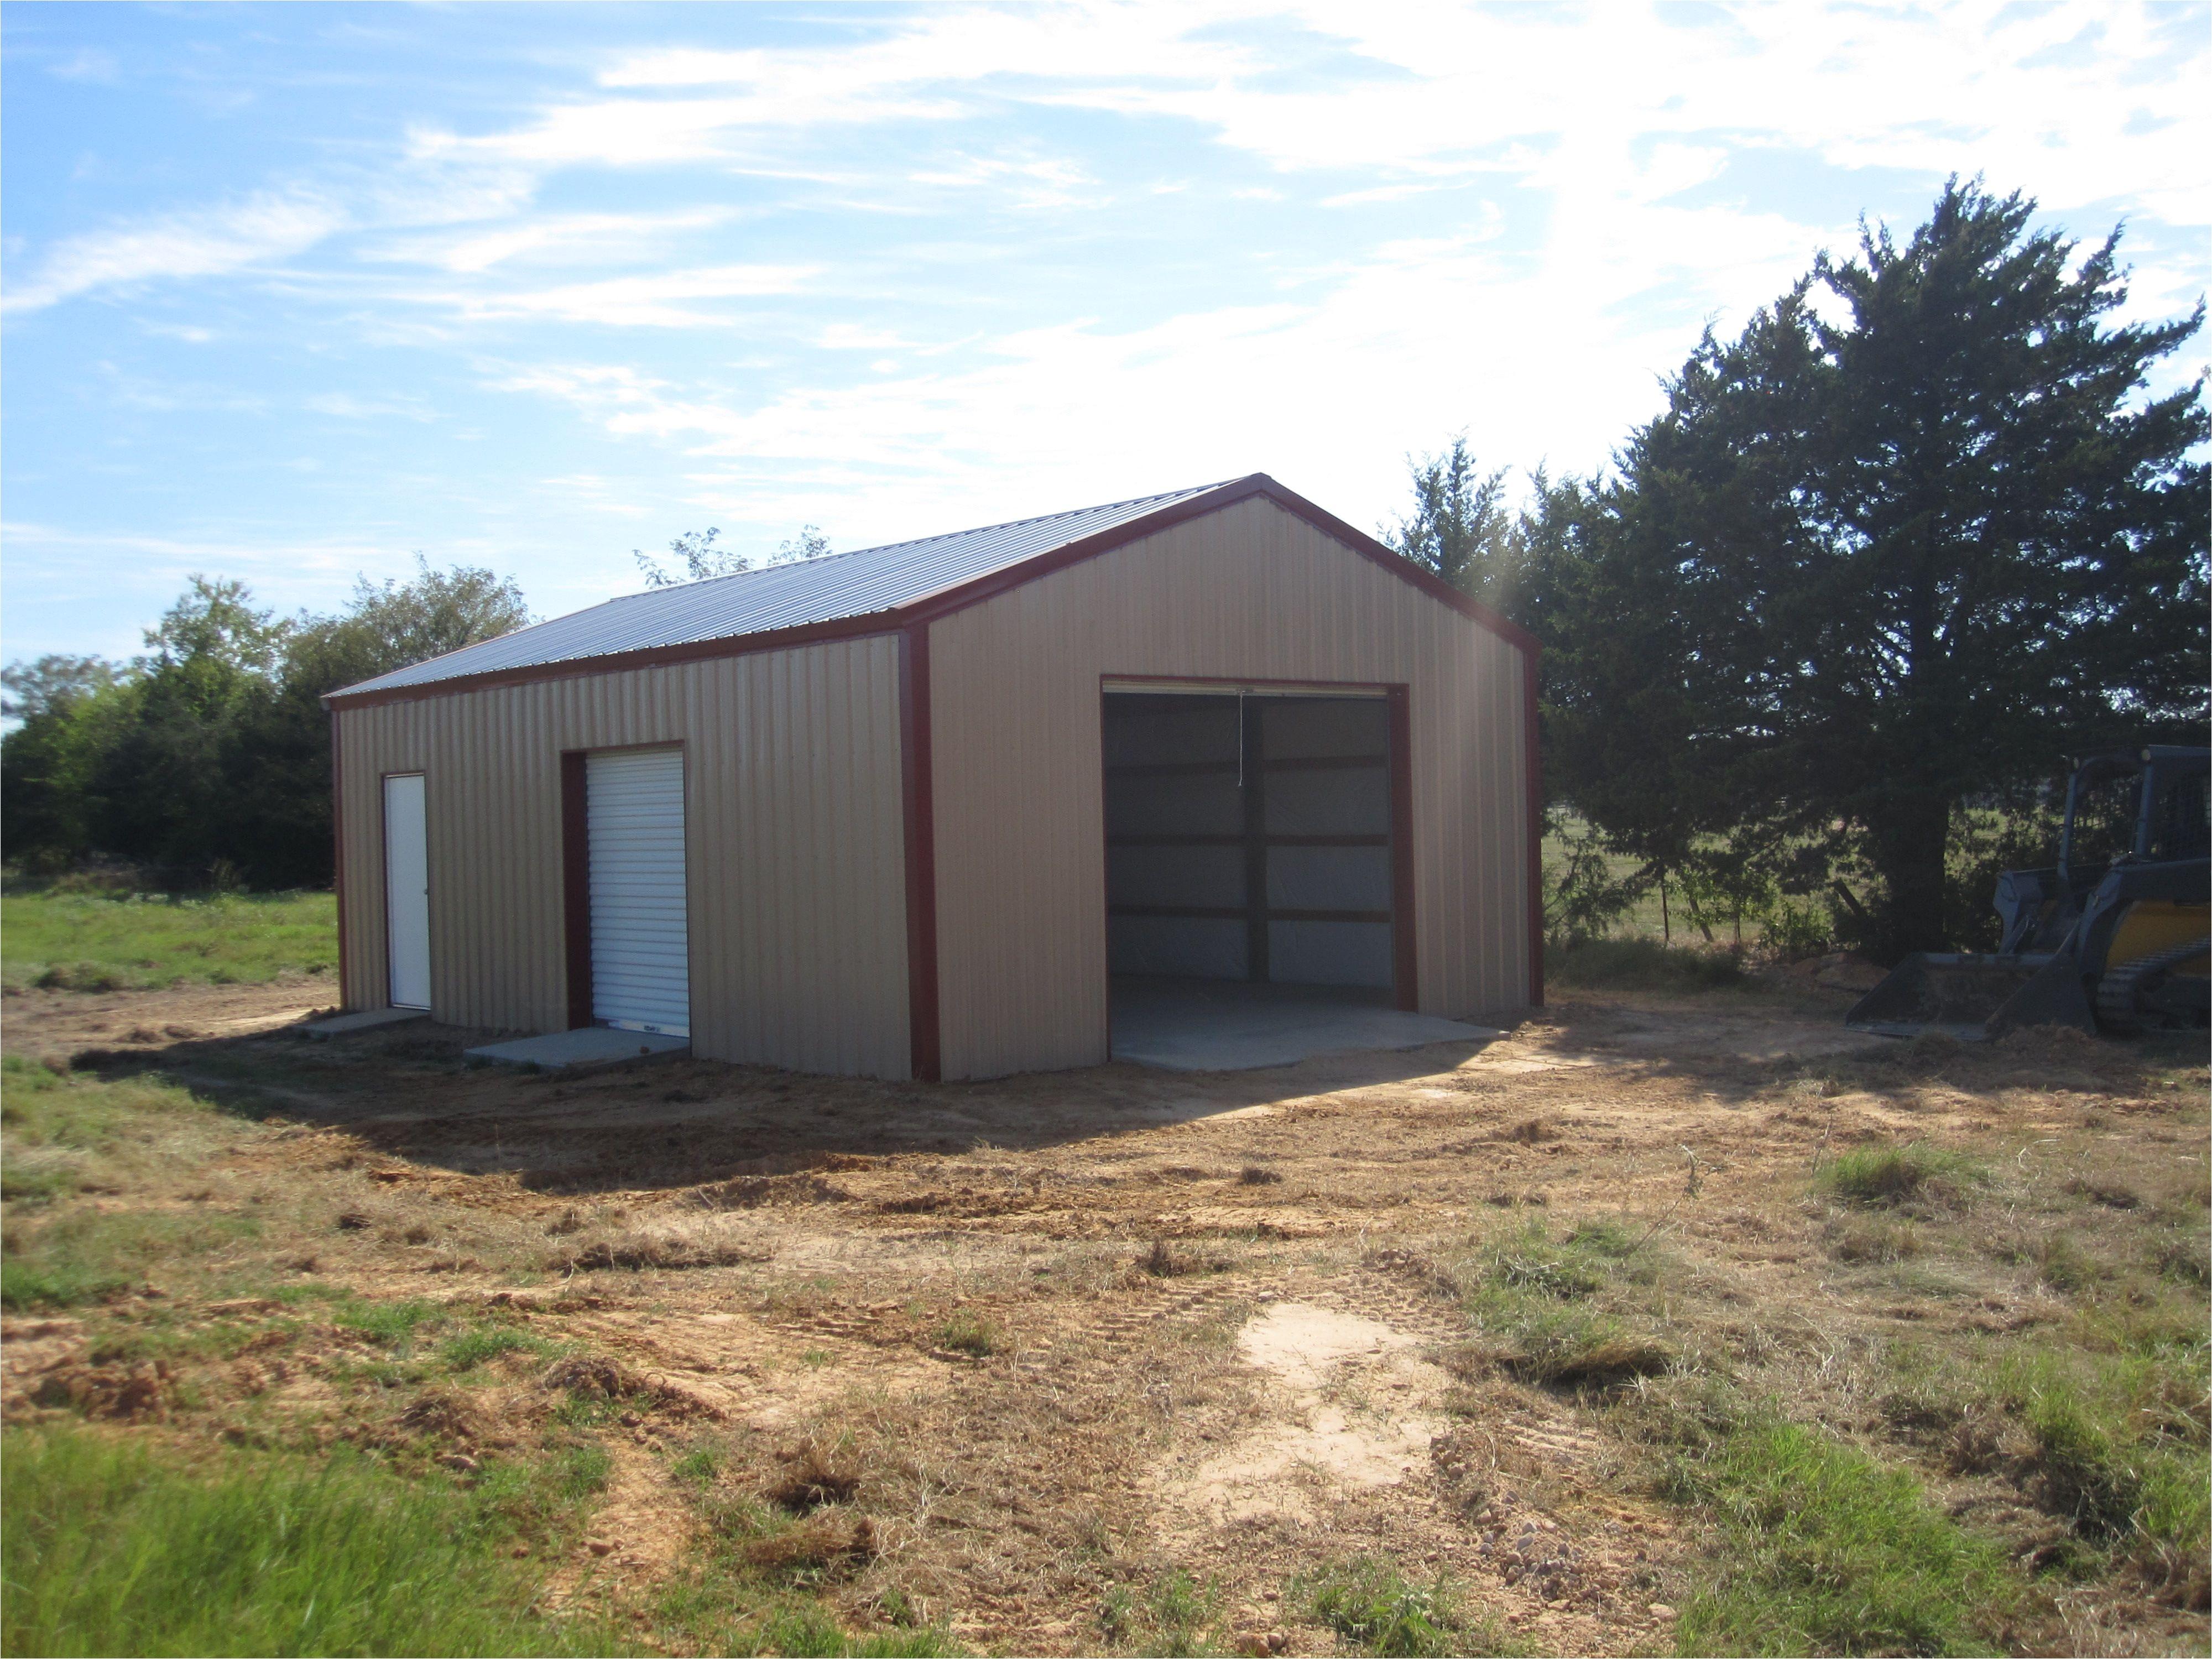 ark la tex pole barn quality barns and buildings